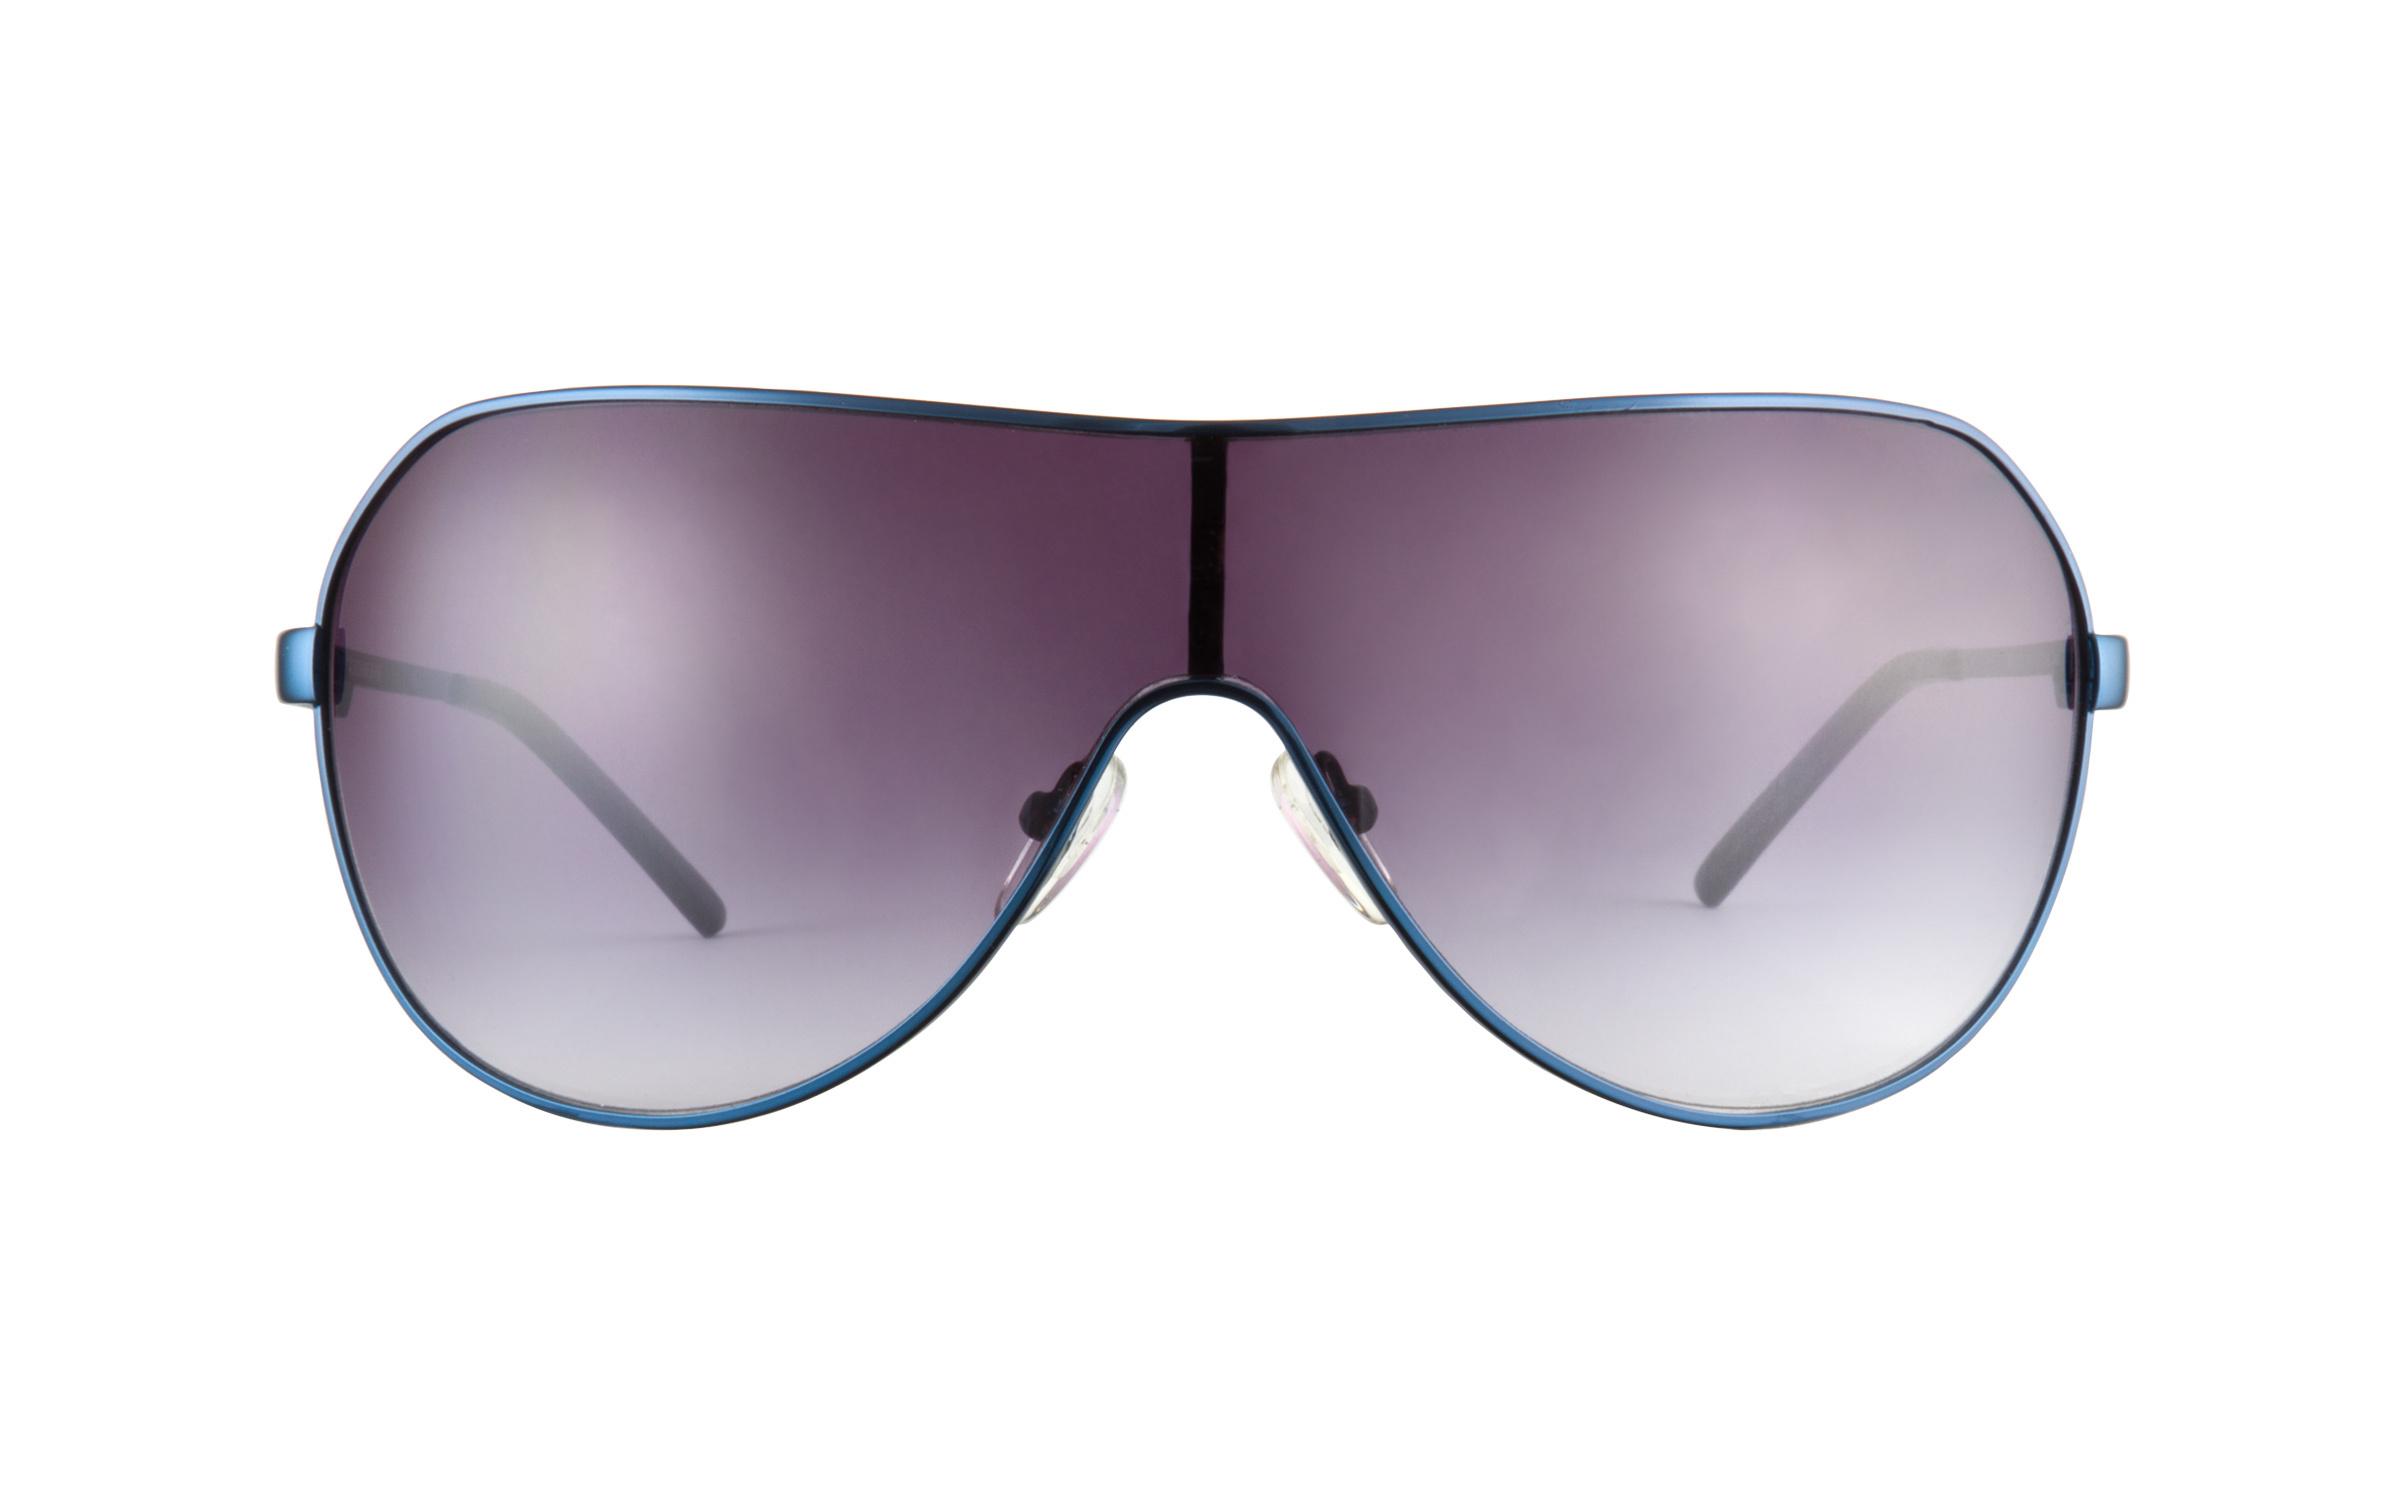 Skechers SK5011 Navy 3 Sunglasses